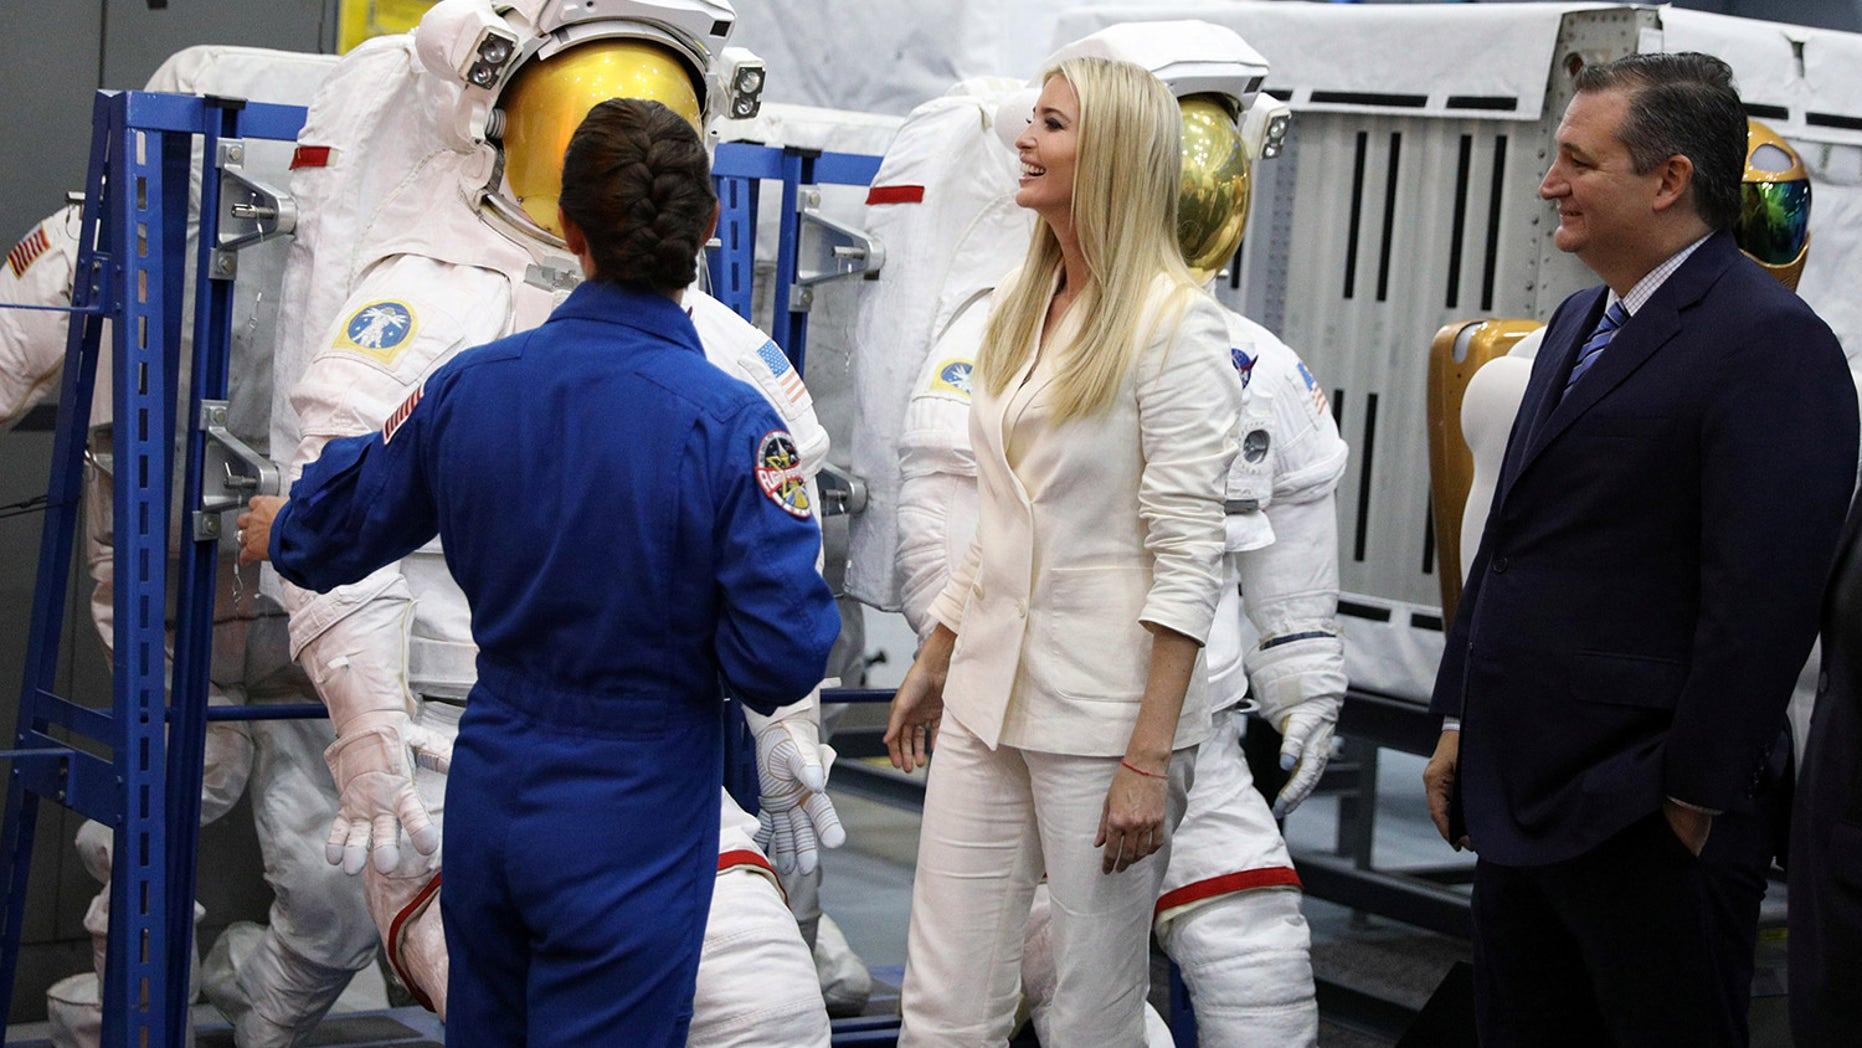 Ivanka Trump and U.S. Sen. Ted Cruz tour NASA's Johnson Space Center in Texas with astronaut Nicole Mann.